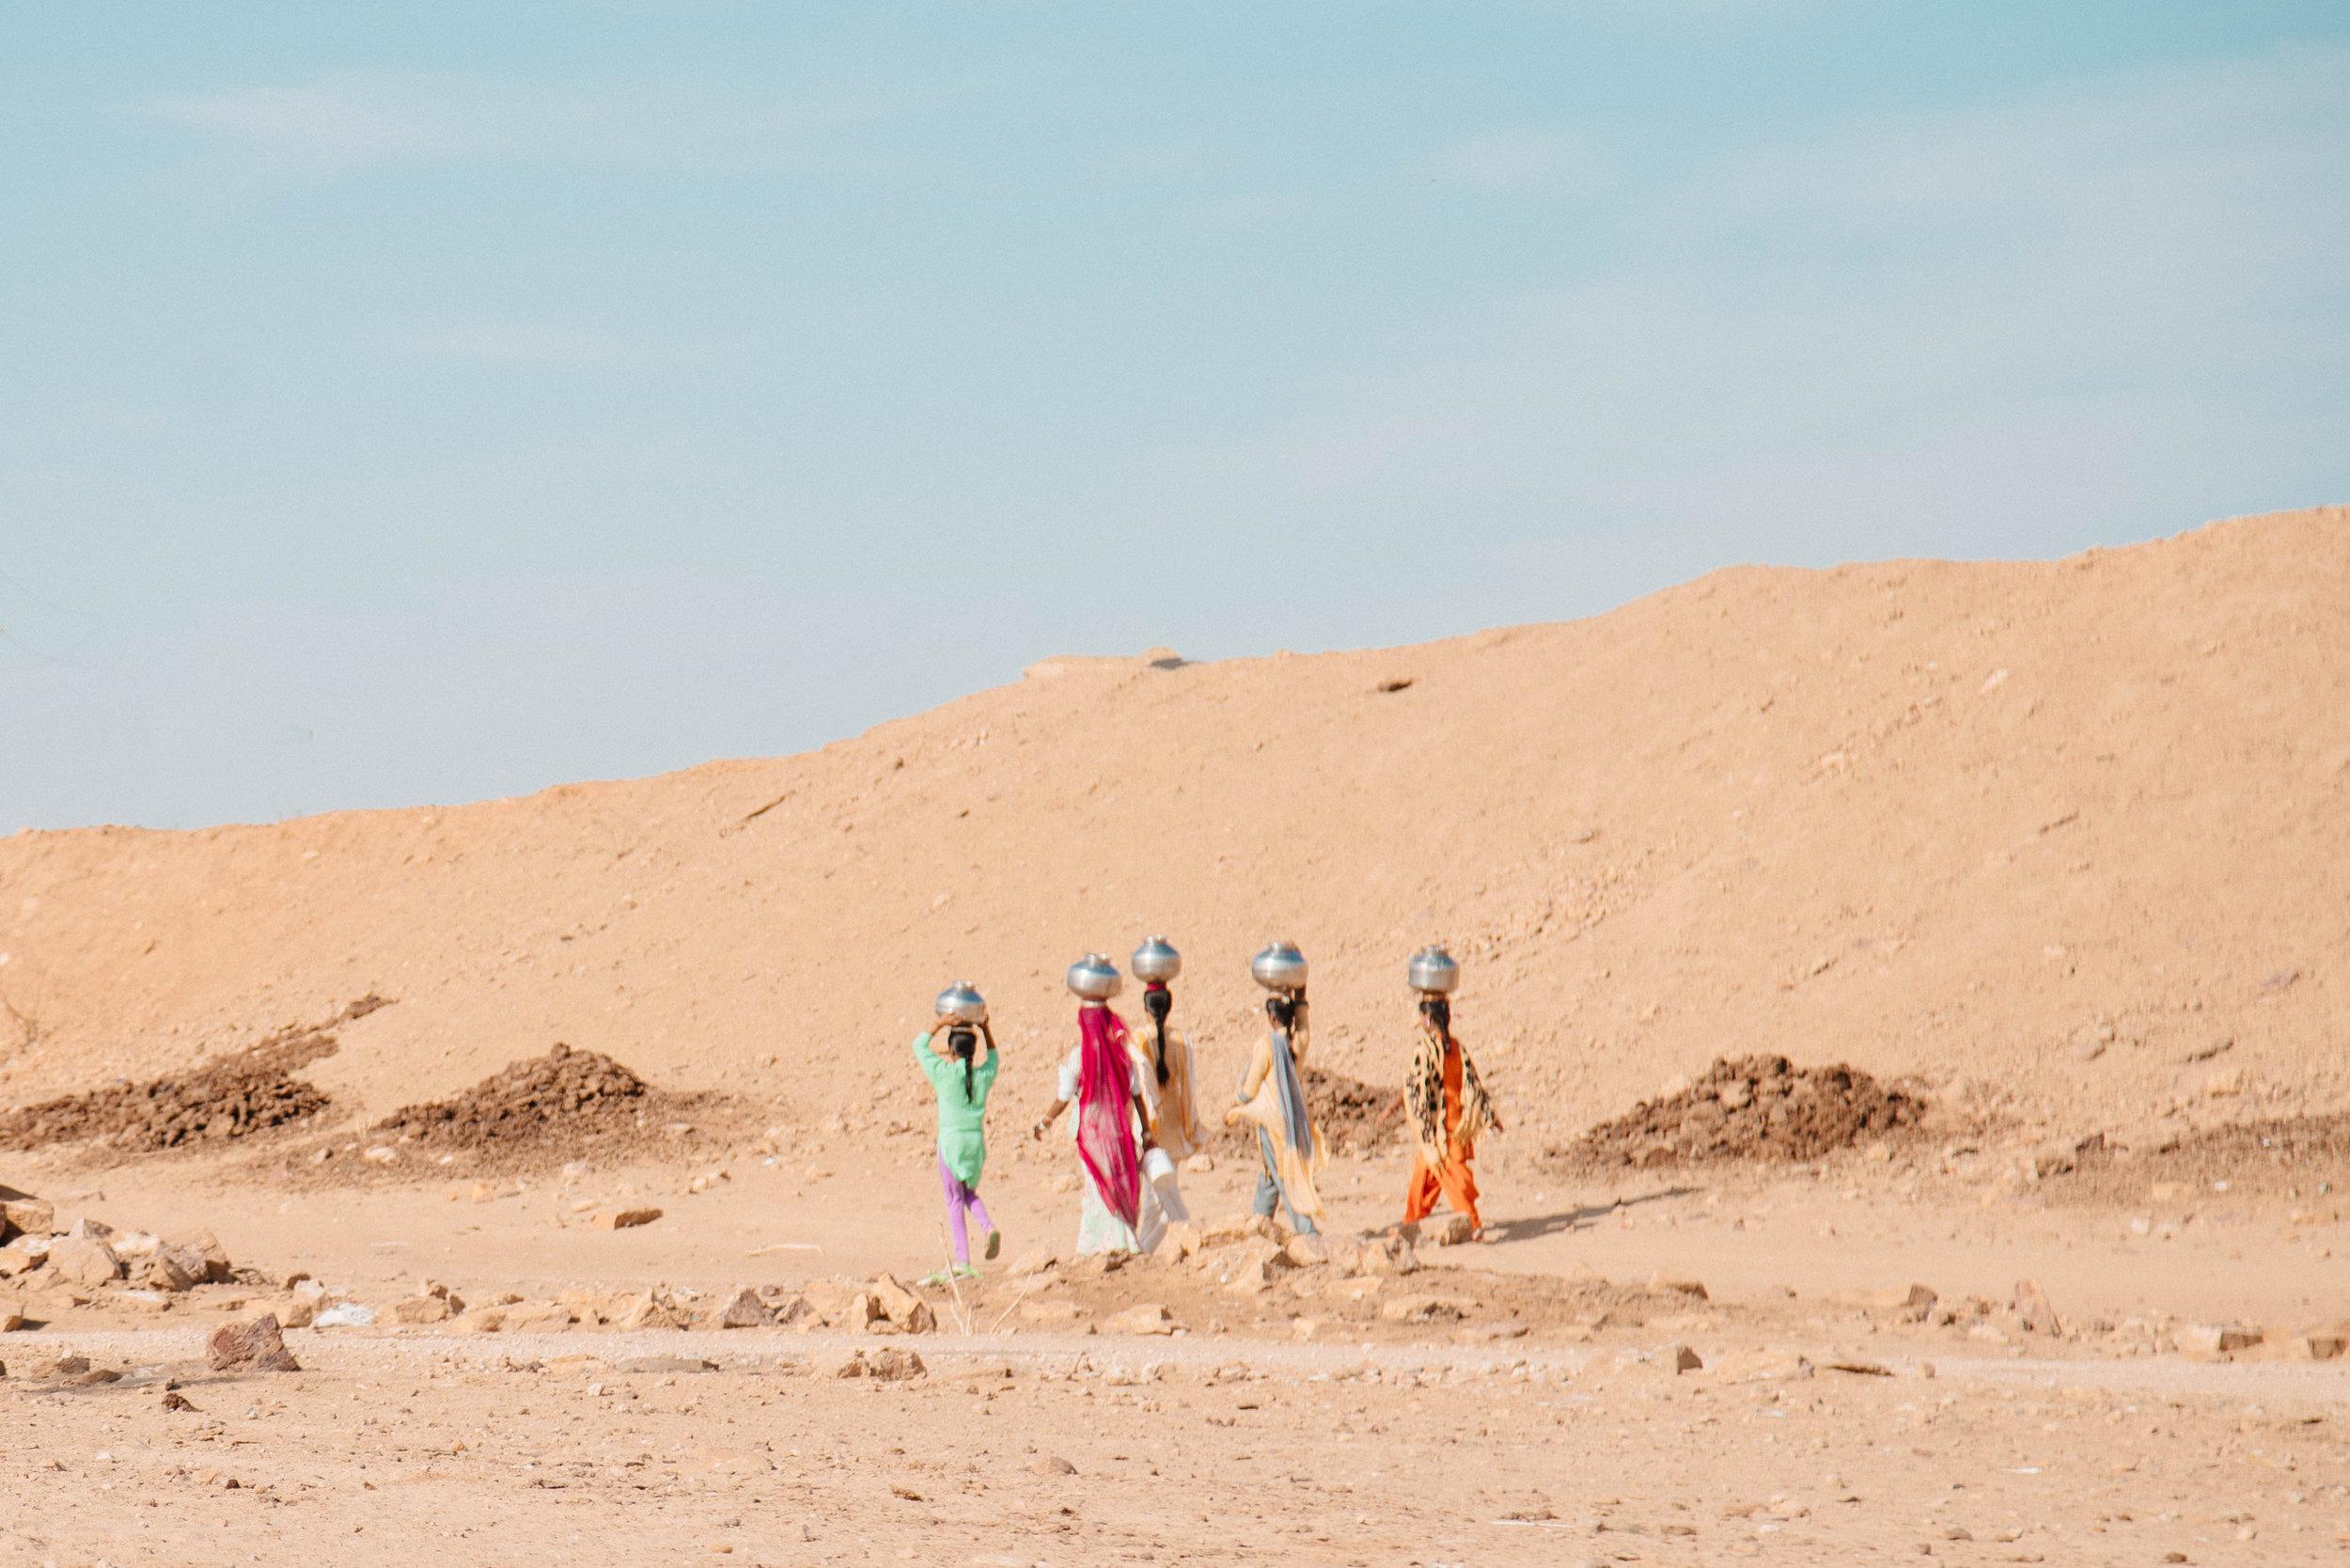 Womenandwater.jpg